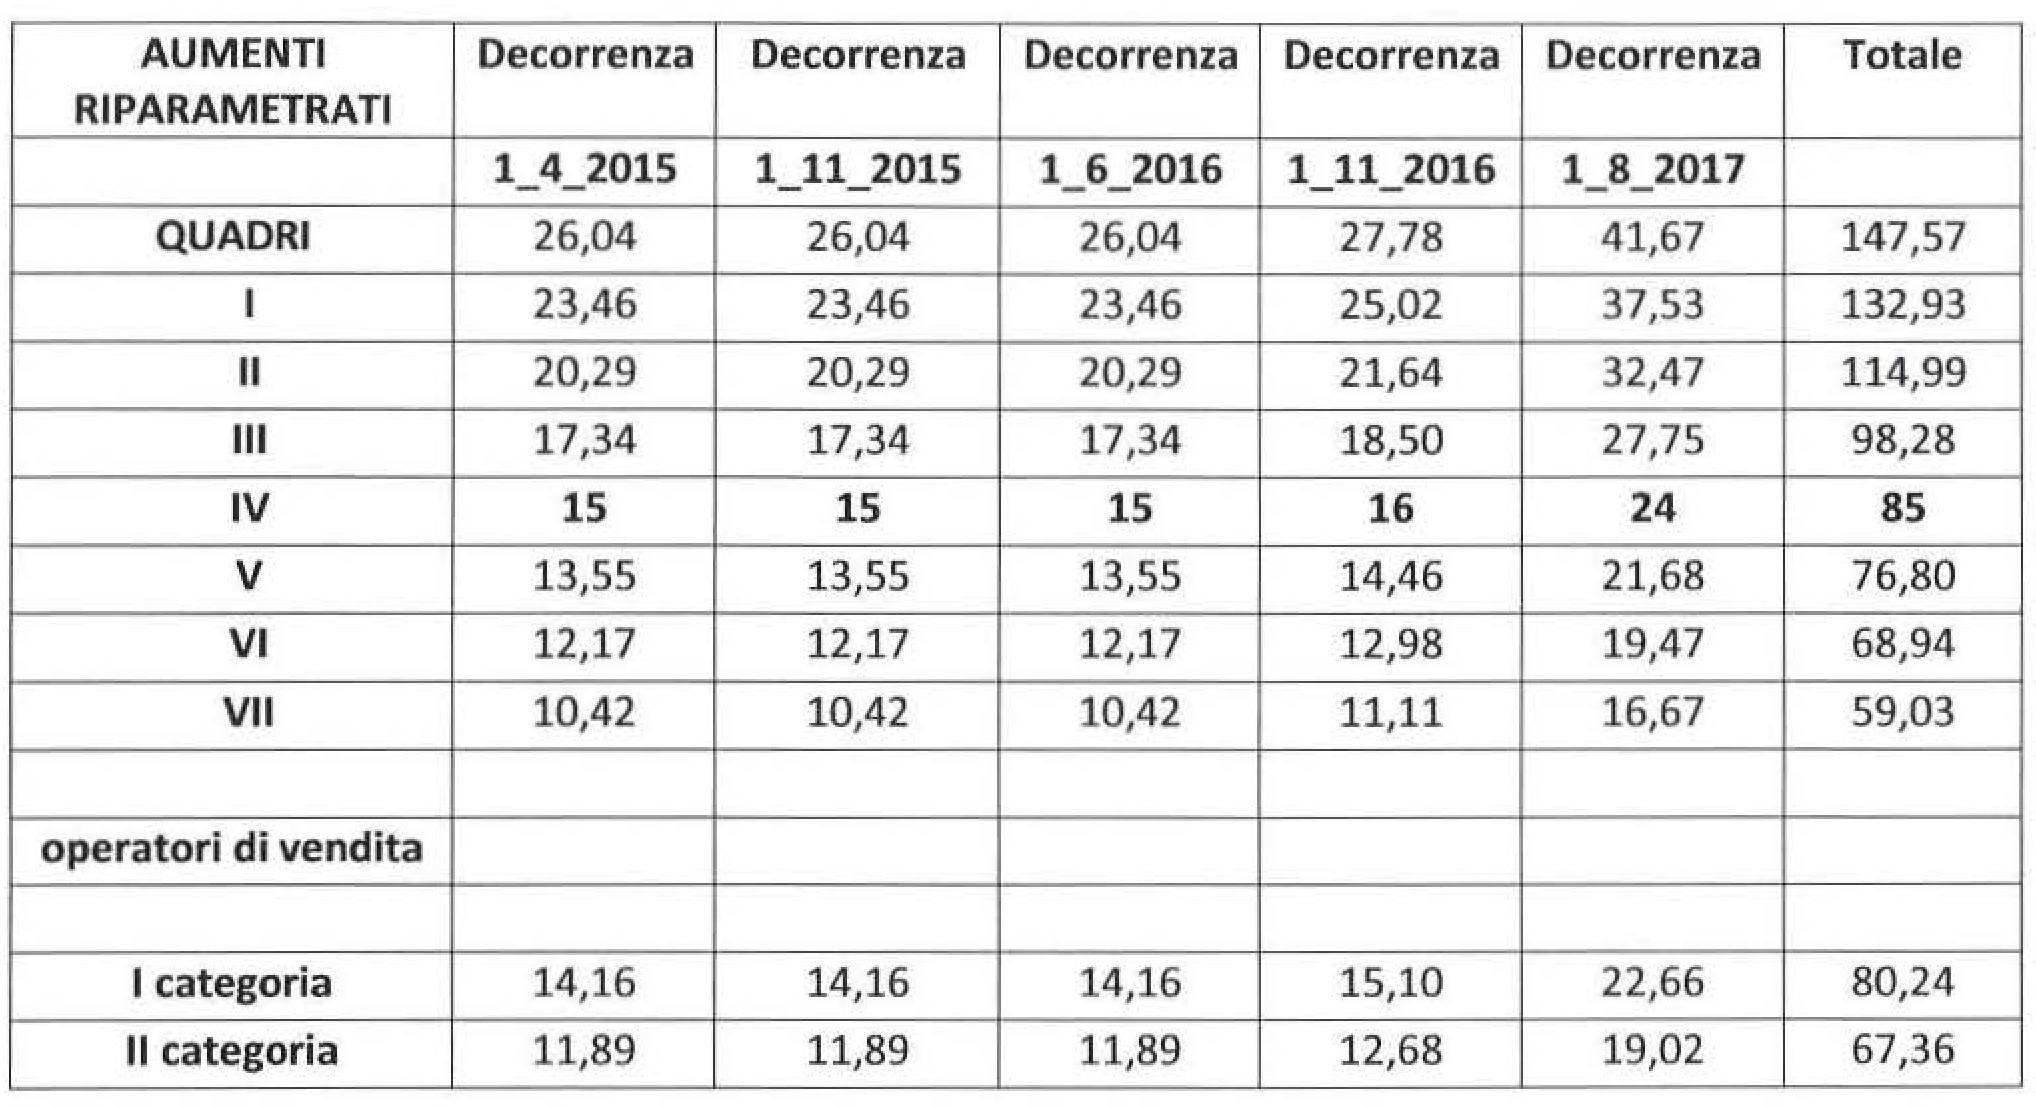 CCNL TERZIARIO COMMERCIO PDF DOWNLOAD